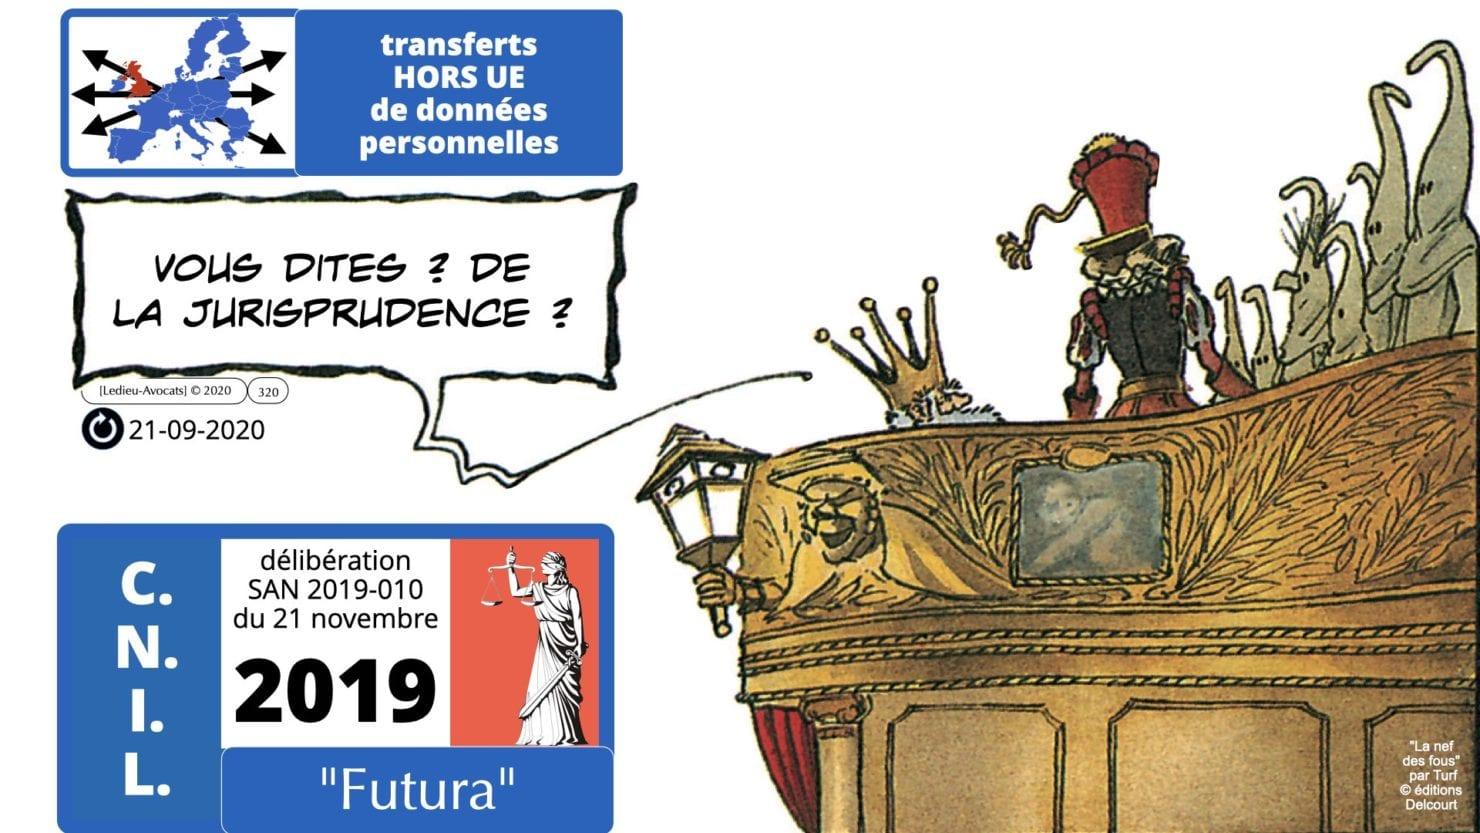 RGPD e-Privacy principes actualité jurisprudence ©Ledieu-Avocats 25-06-2021.320